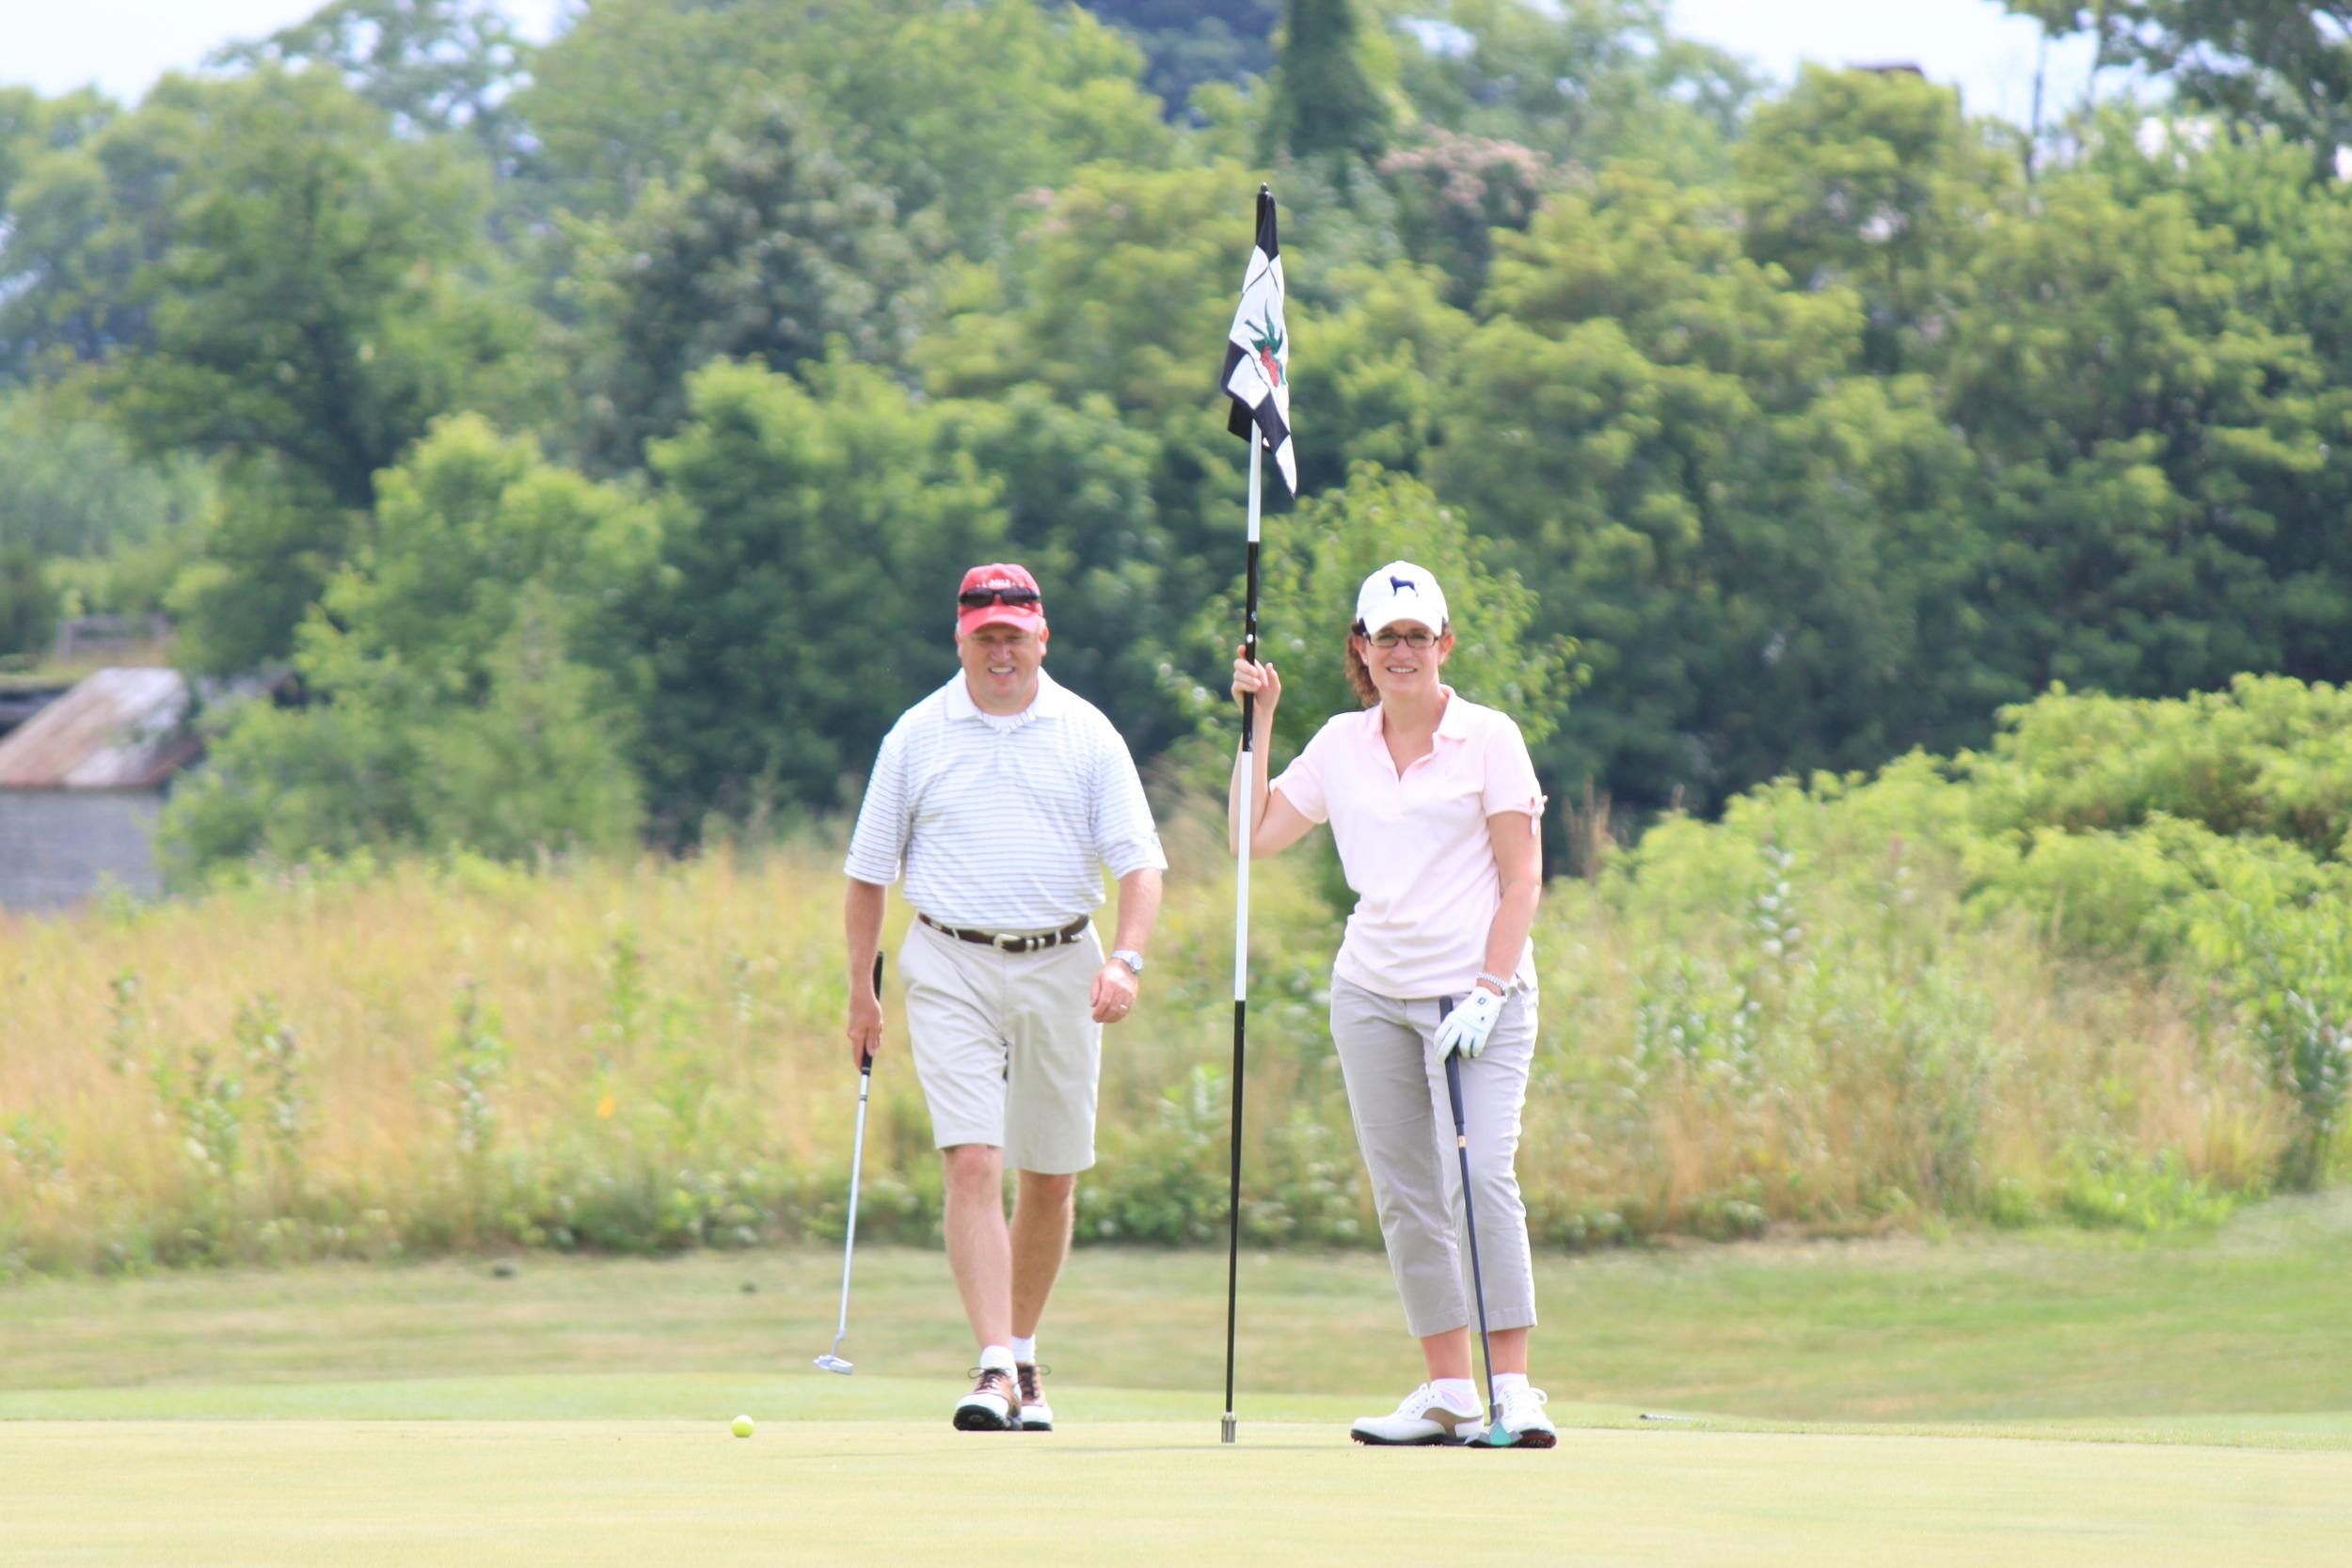 Dennis_Fitzgerald_Golf_Tournament_2011_IMG_3431.JPG